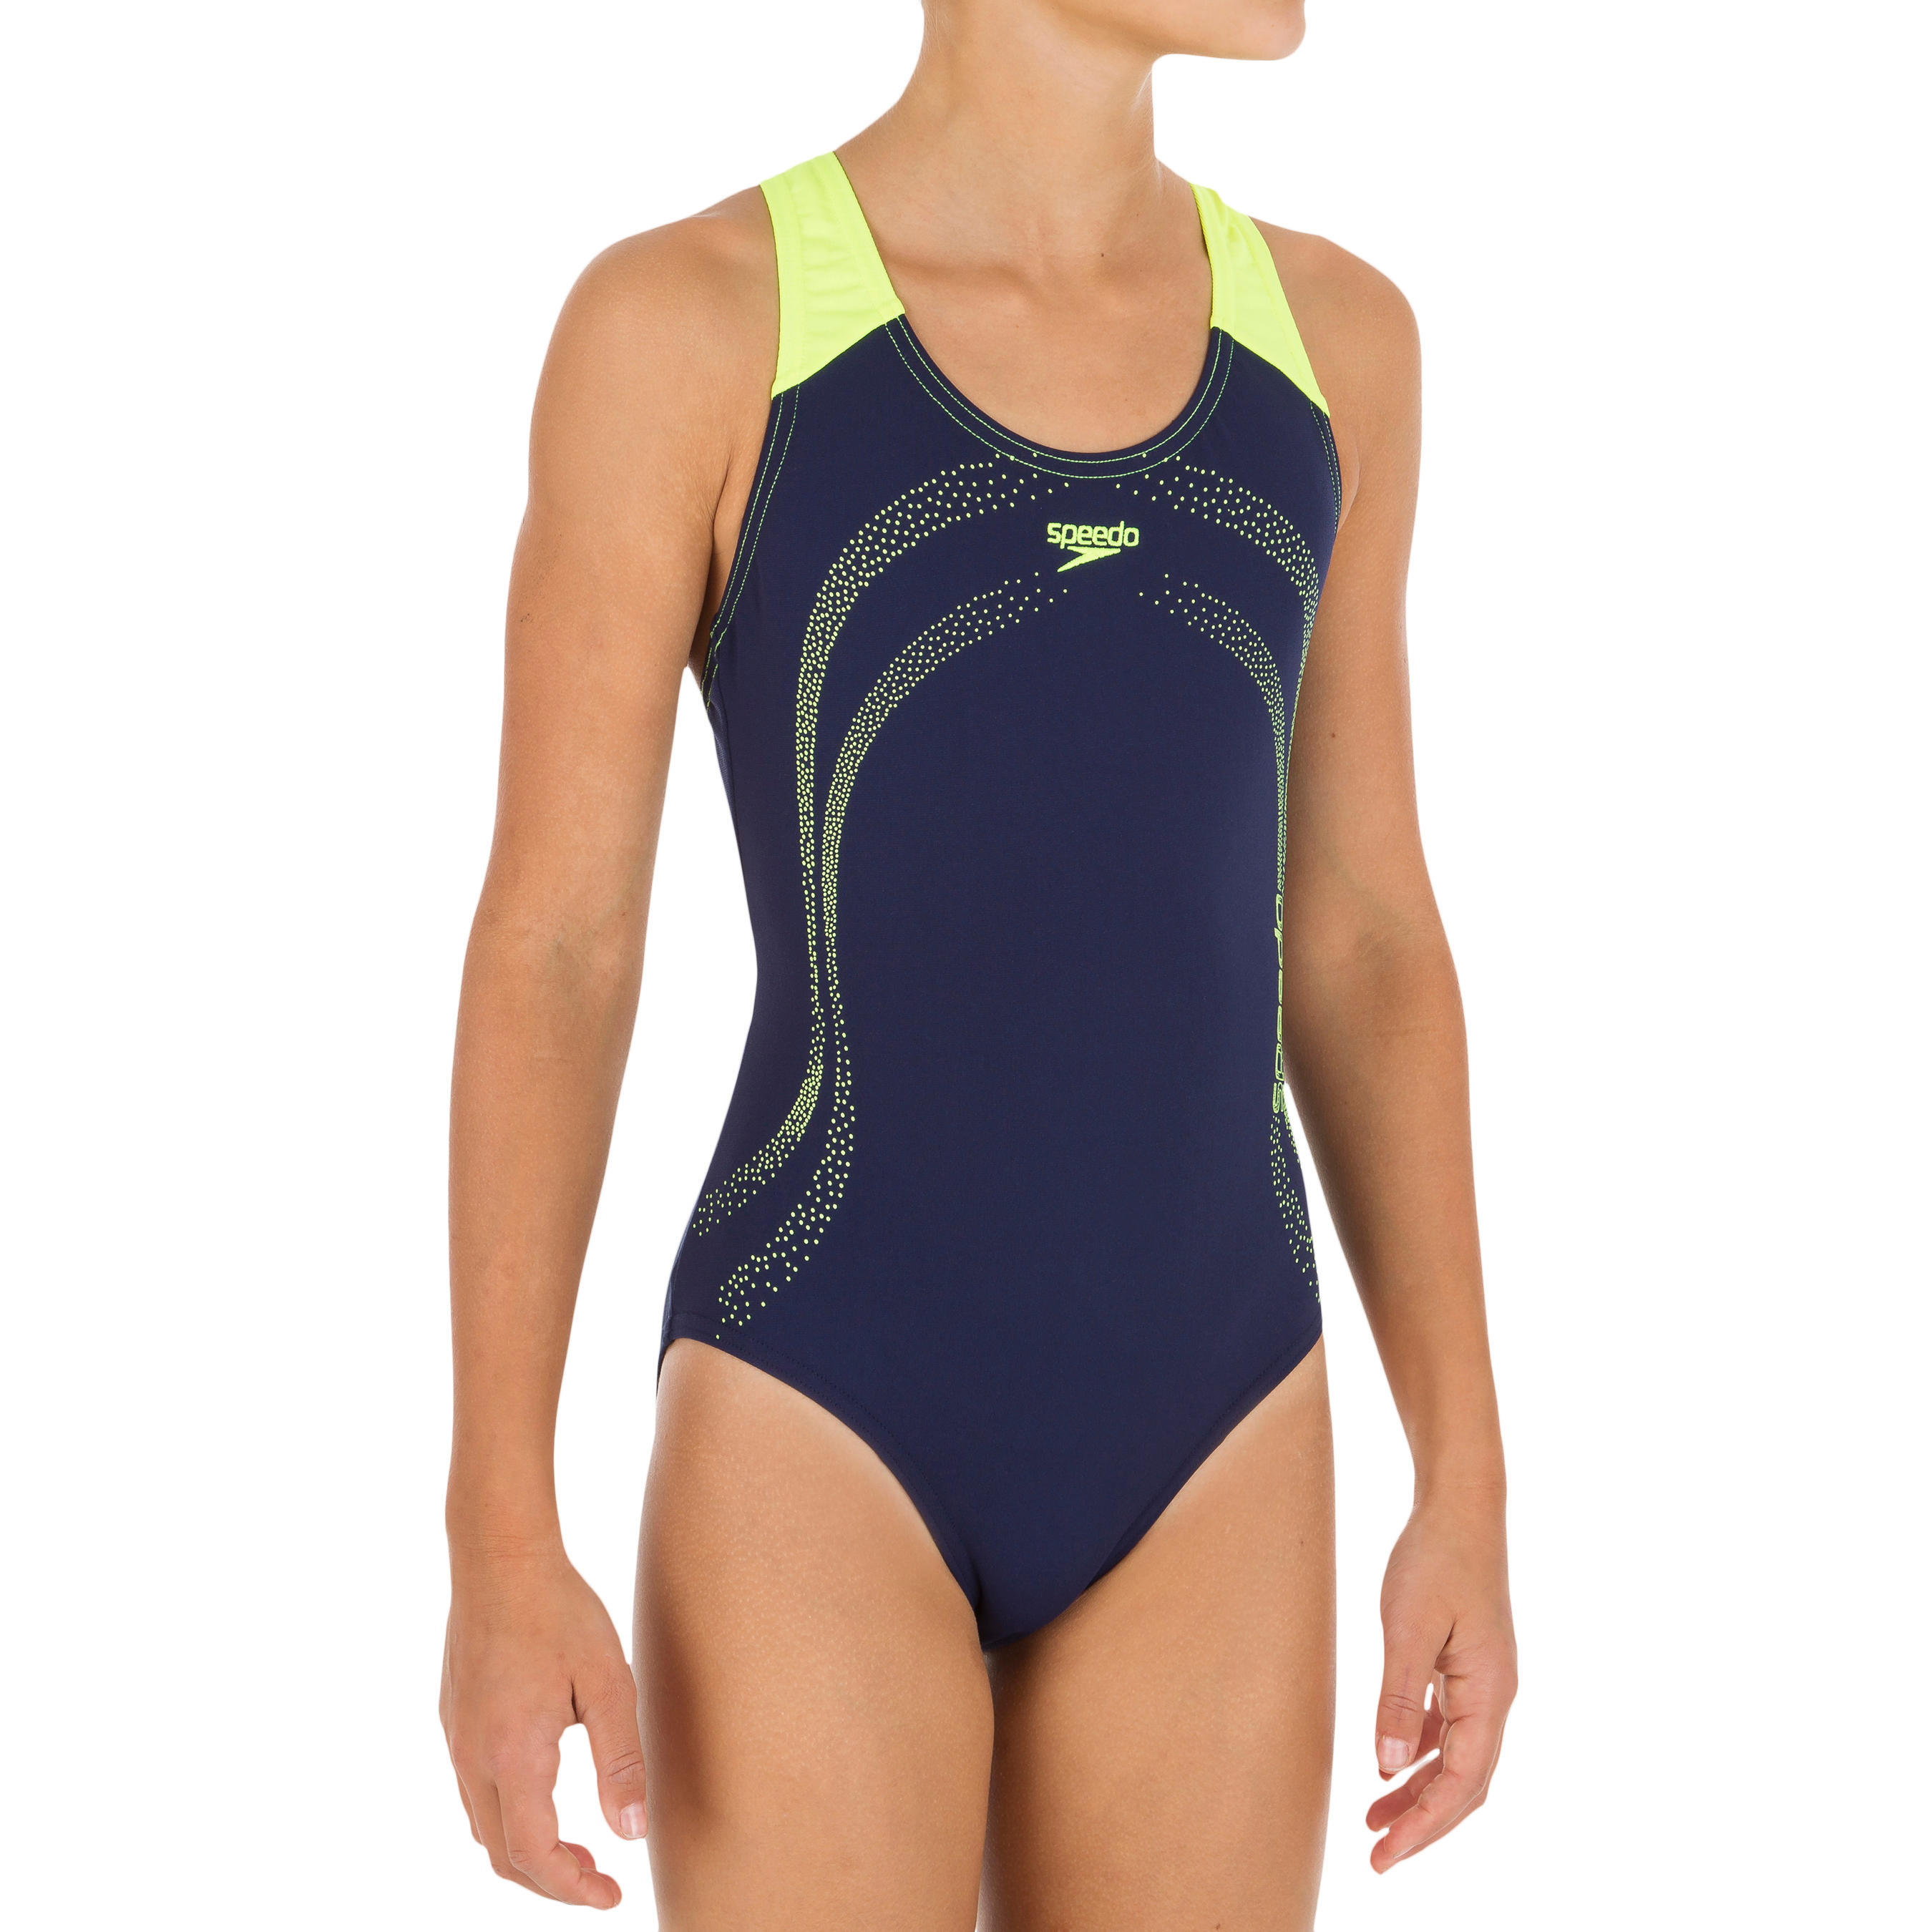 Meisjesbadpak Splash marineblauw-geel